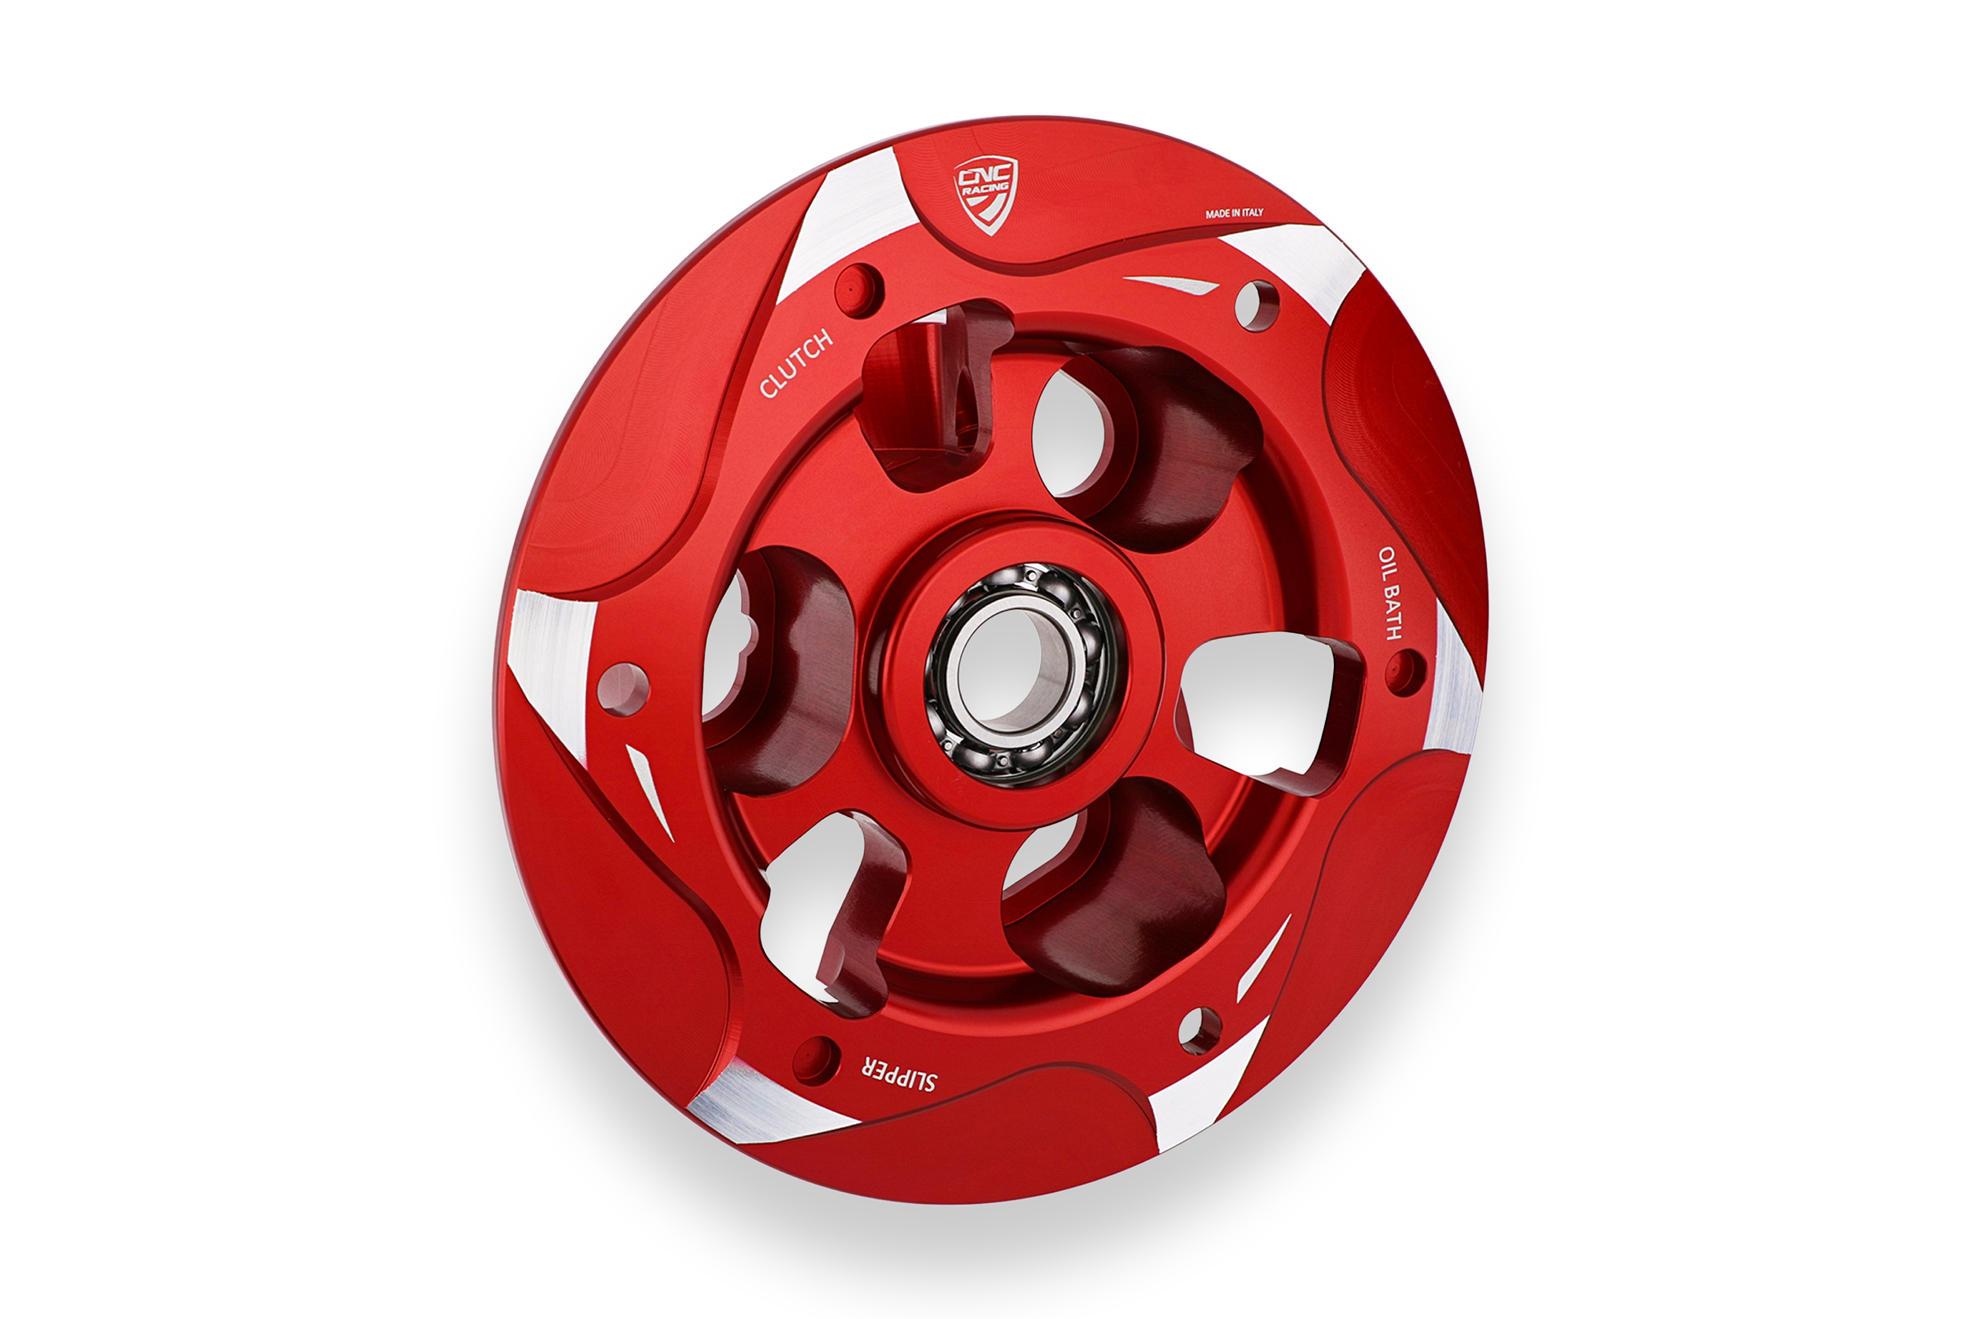 Pressure plate CNC Racing สำหรับ Diavel 2011-2015